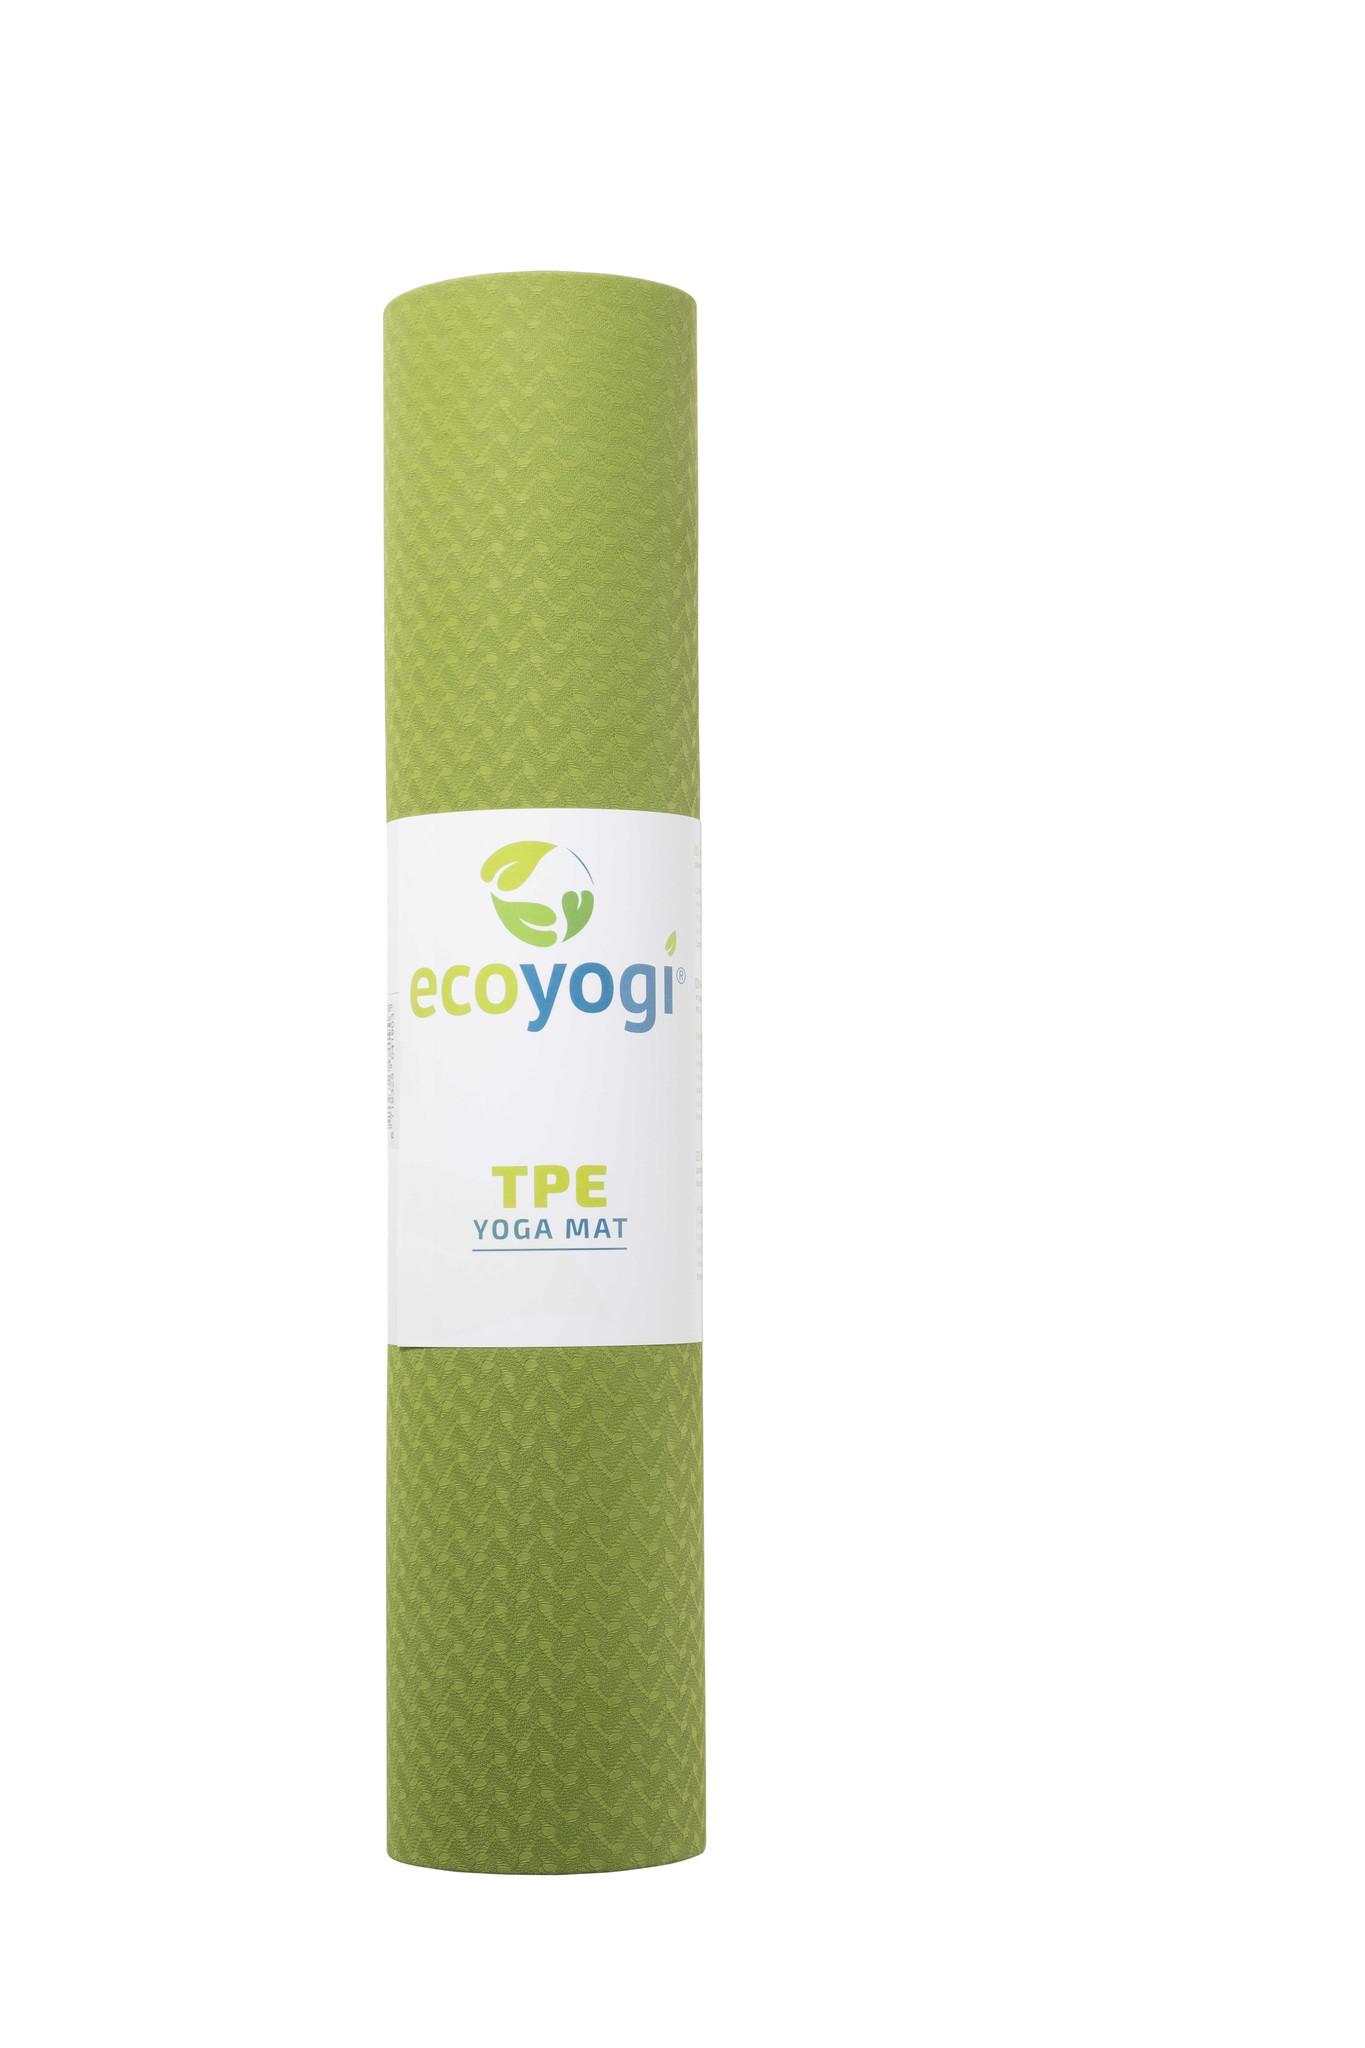 Wonderbaar Ecoyogi TPE Yoga mat Groen/zwart - 6 mm - 2Essence - Yogamat IP-55